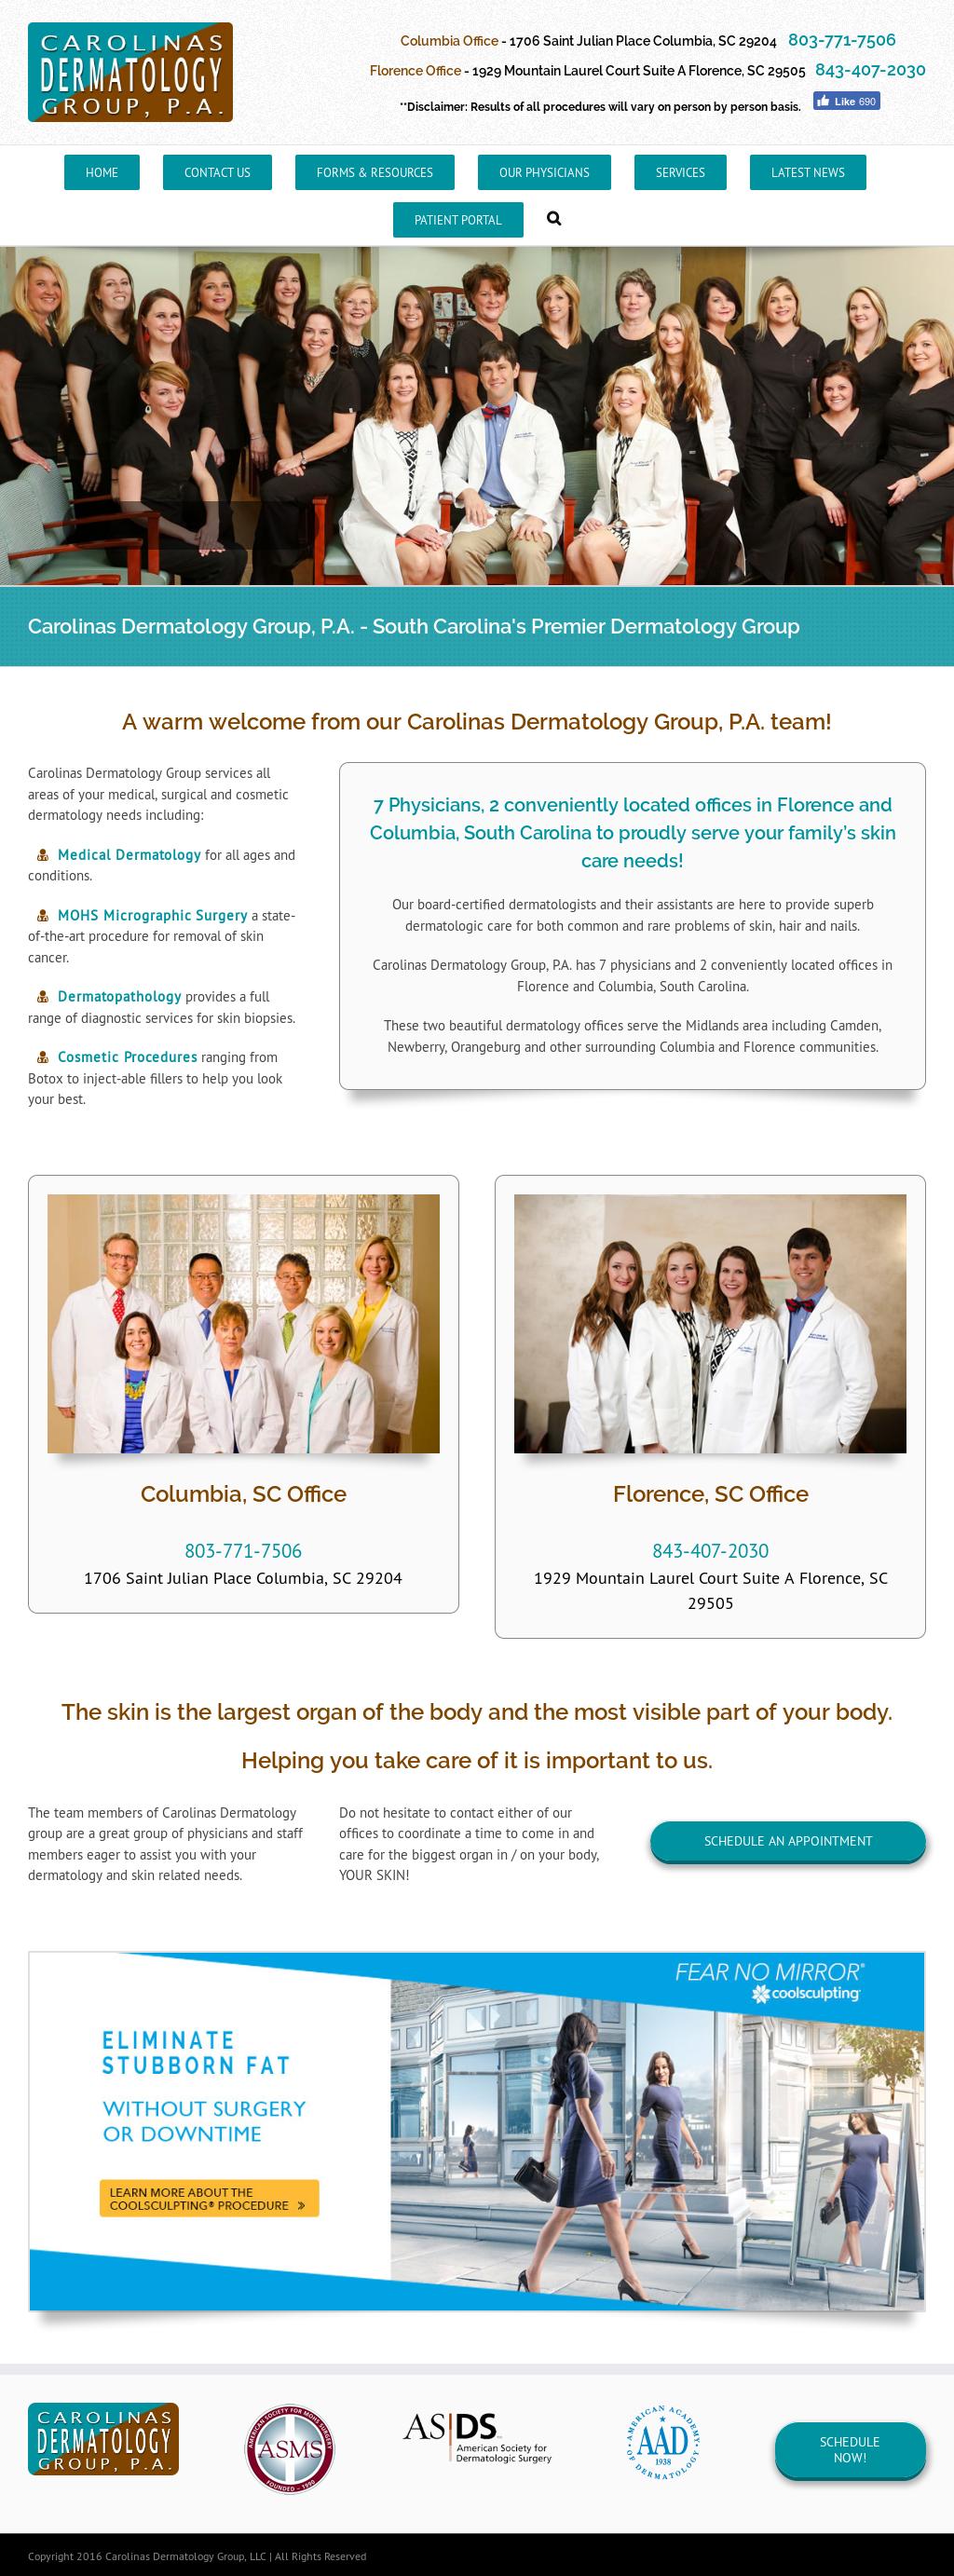 Carolinas Dermatology Group Competitors, Revenue and